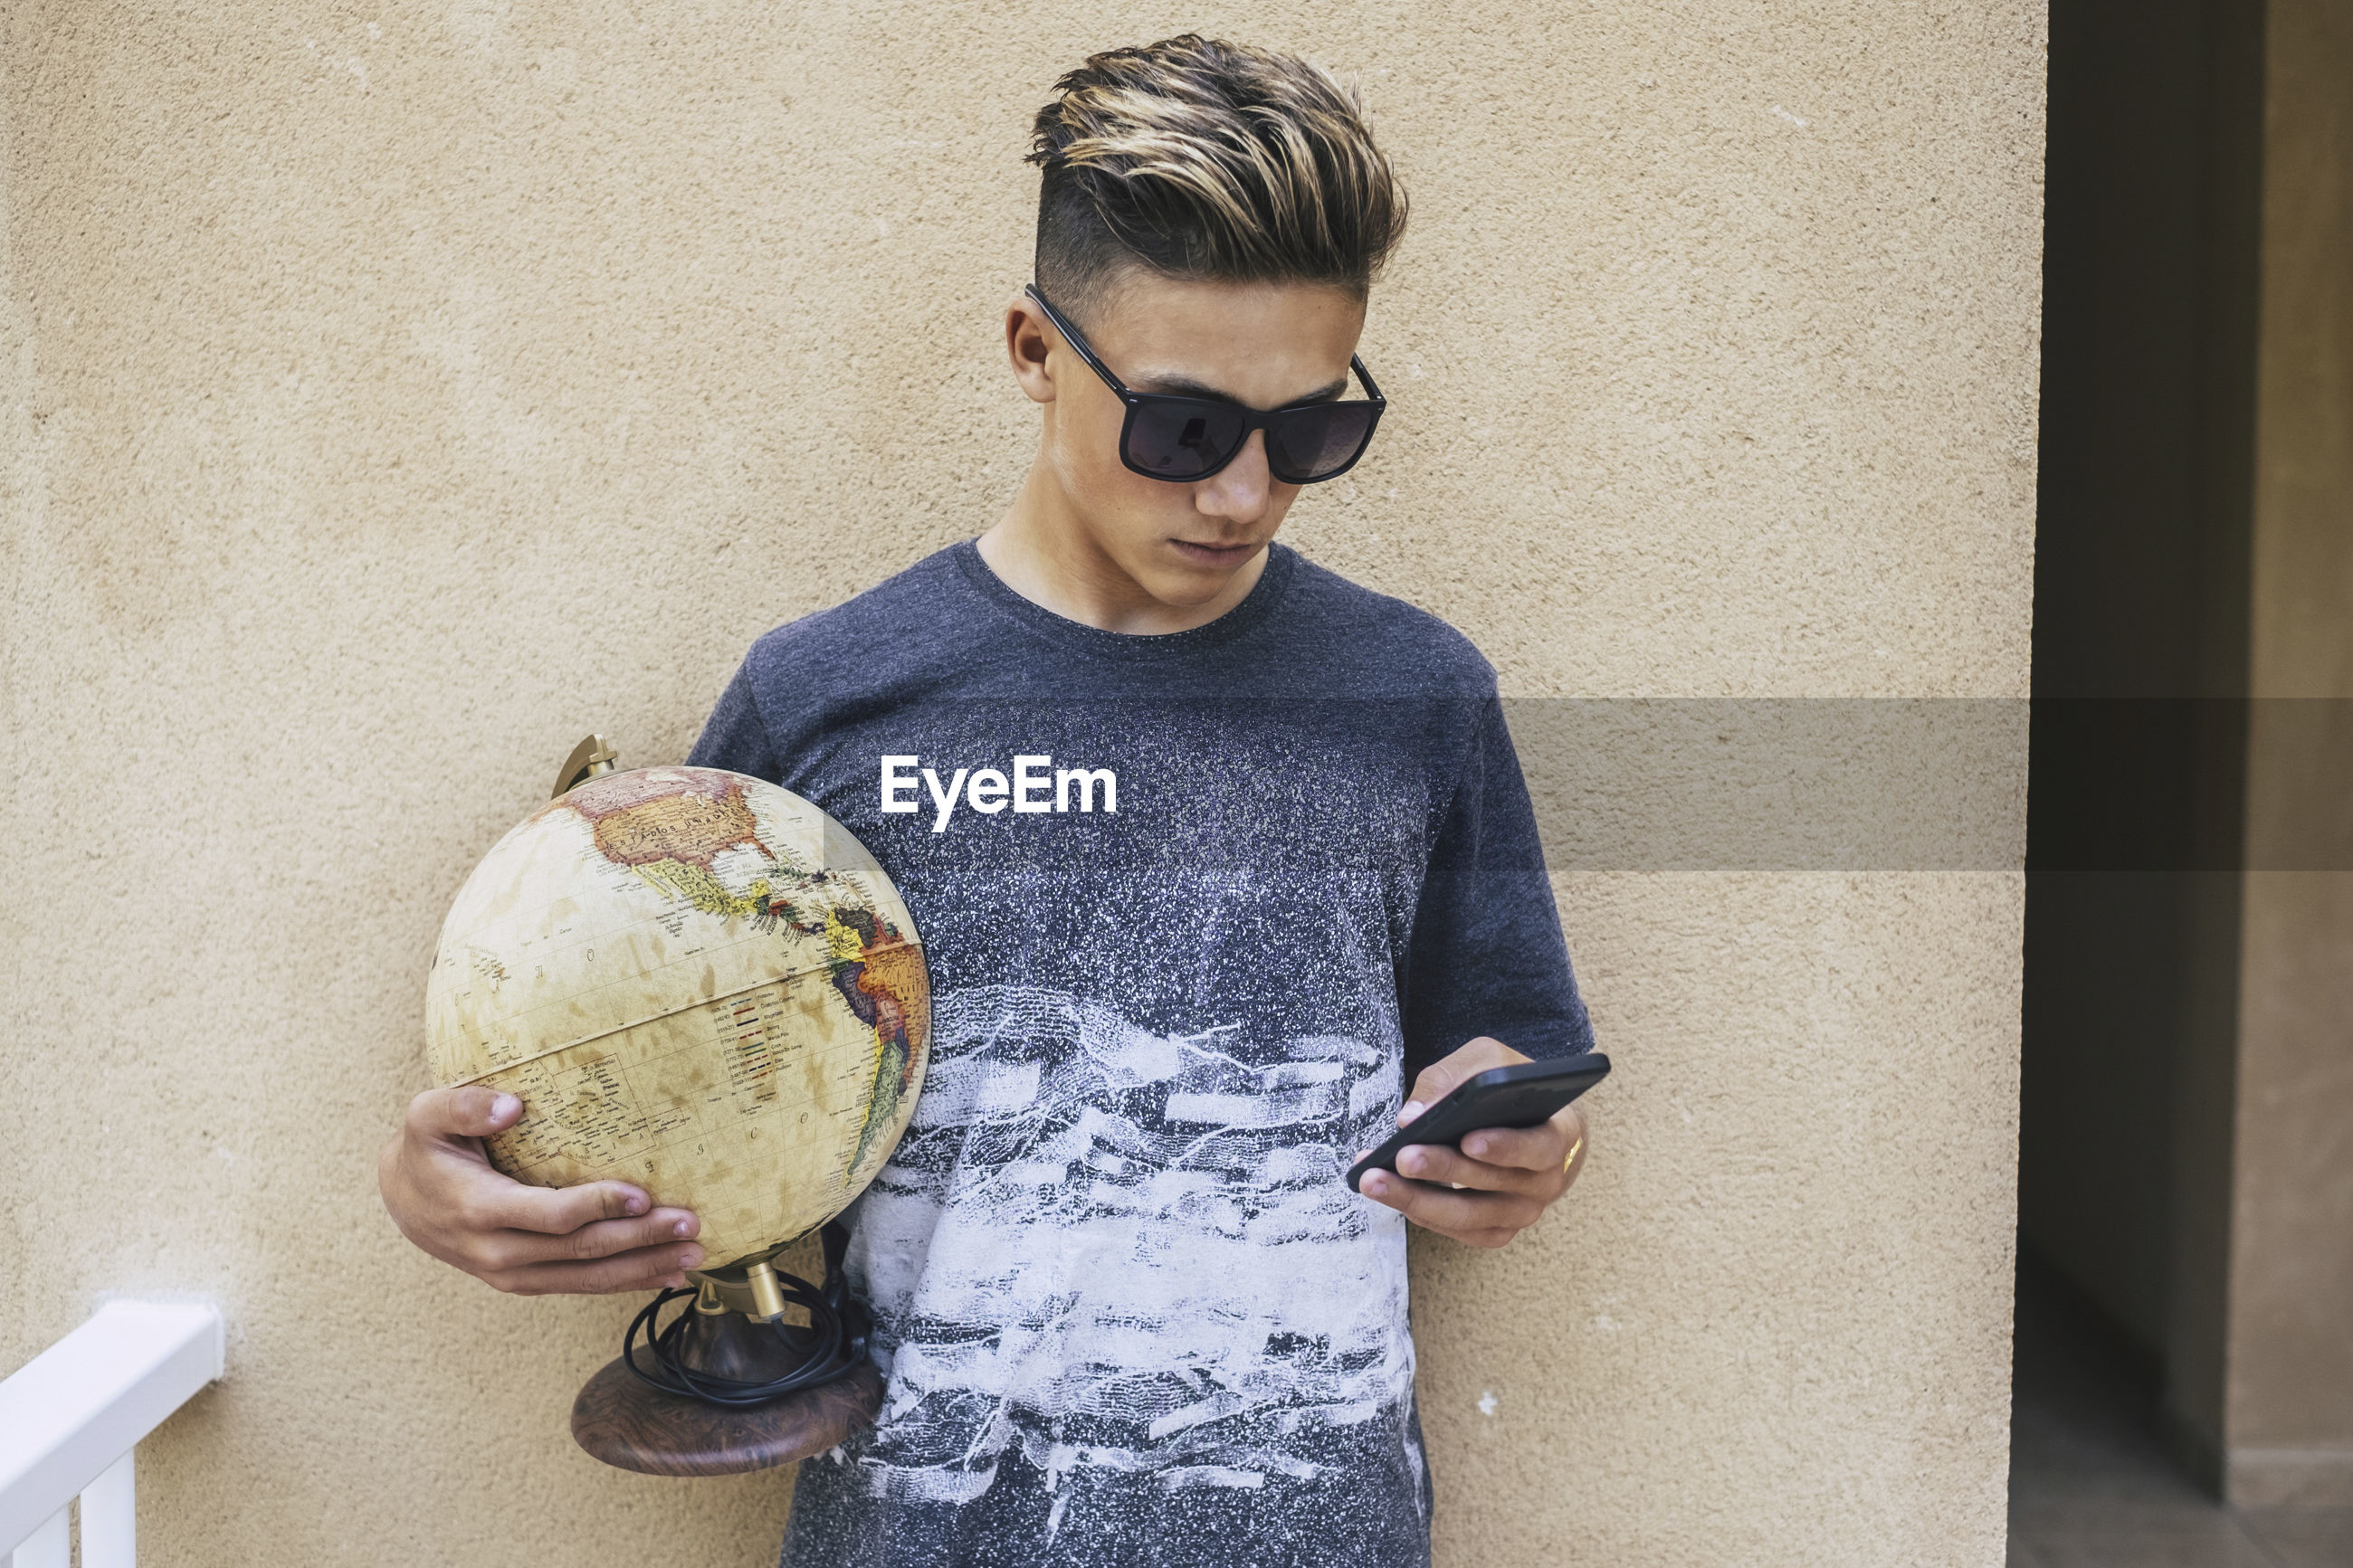 Teenage boy using mobile phone while holding globe against wall